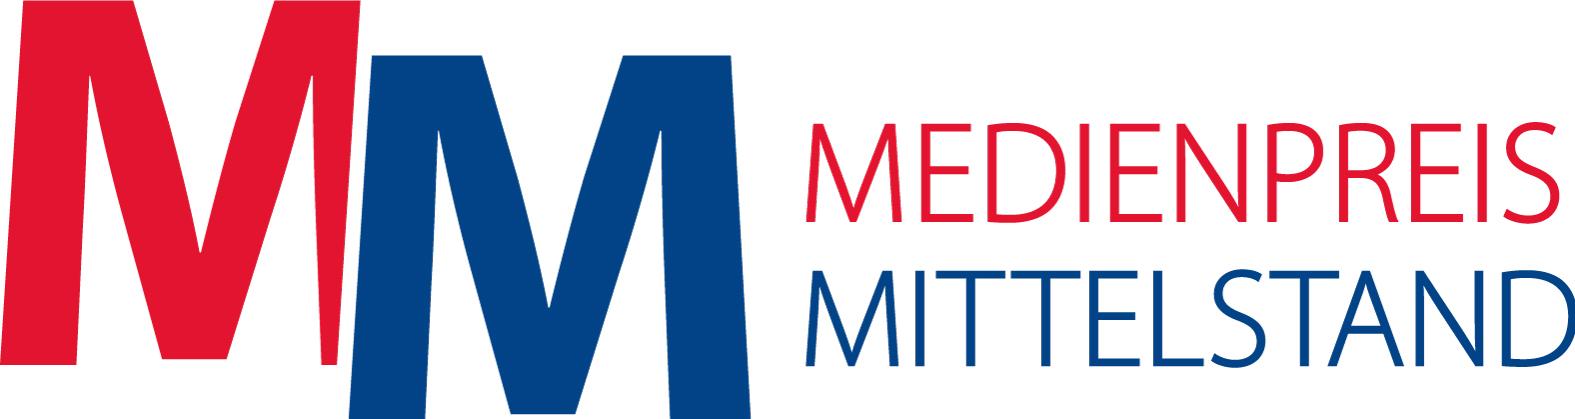 Medienpreis Mittelstand